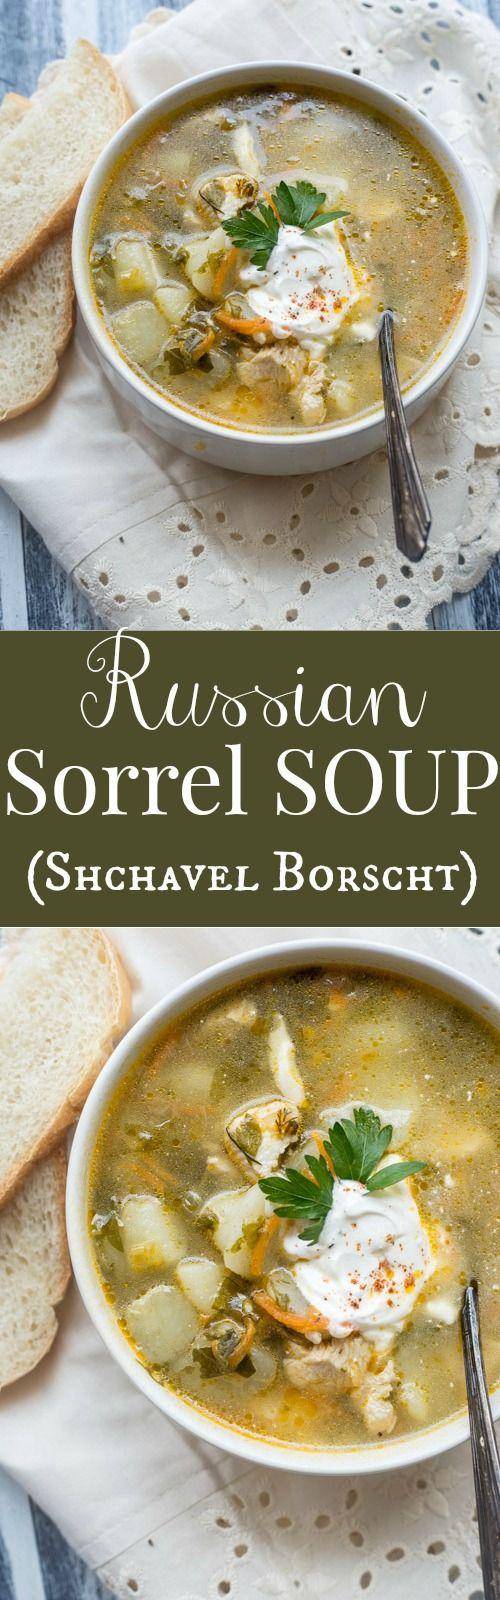 Sorrel Soup (Green Schavel Borscht) ValentinasCorner.com